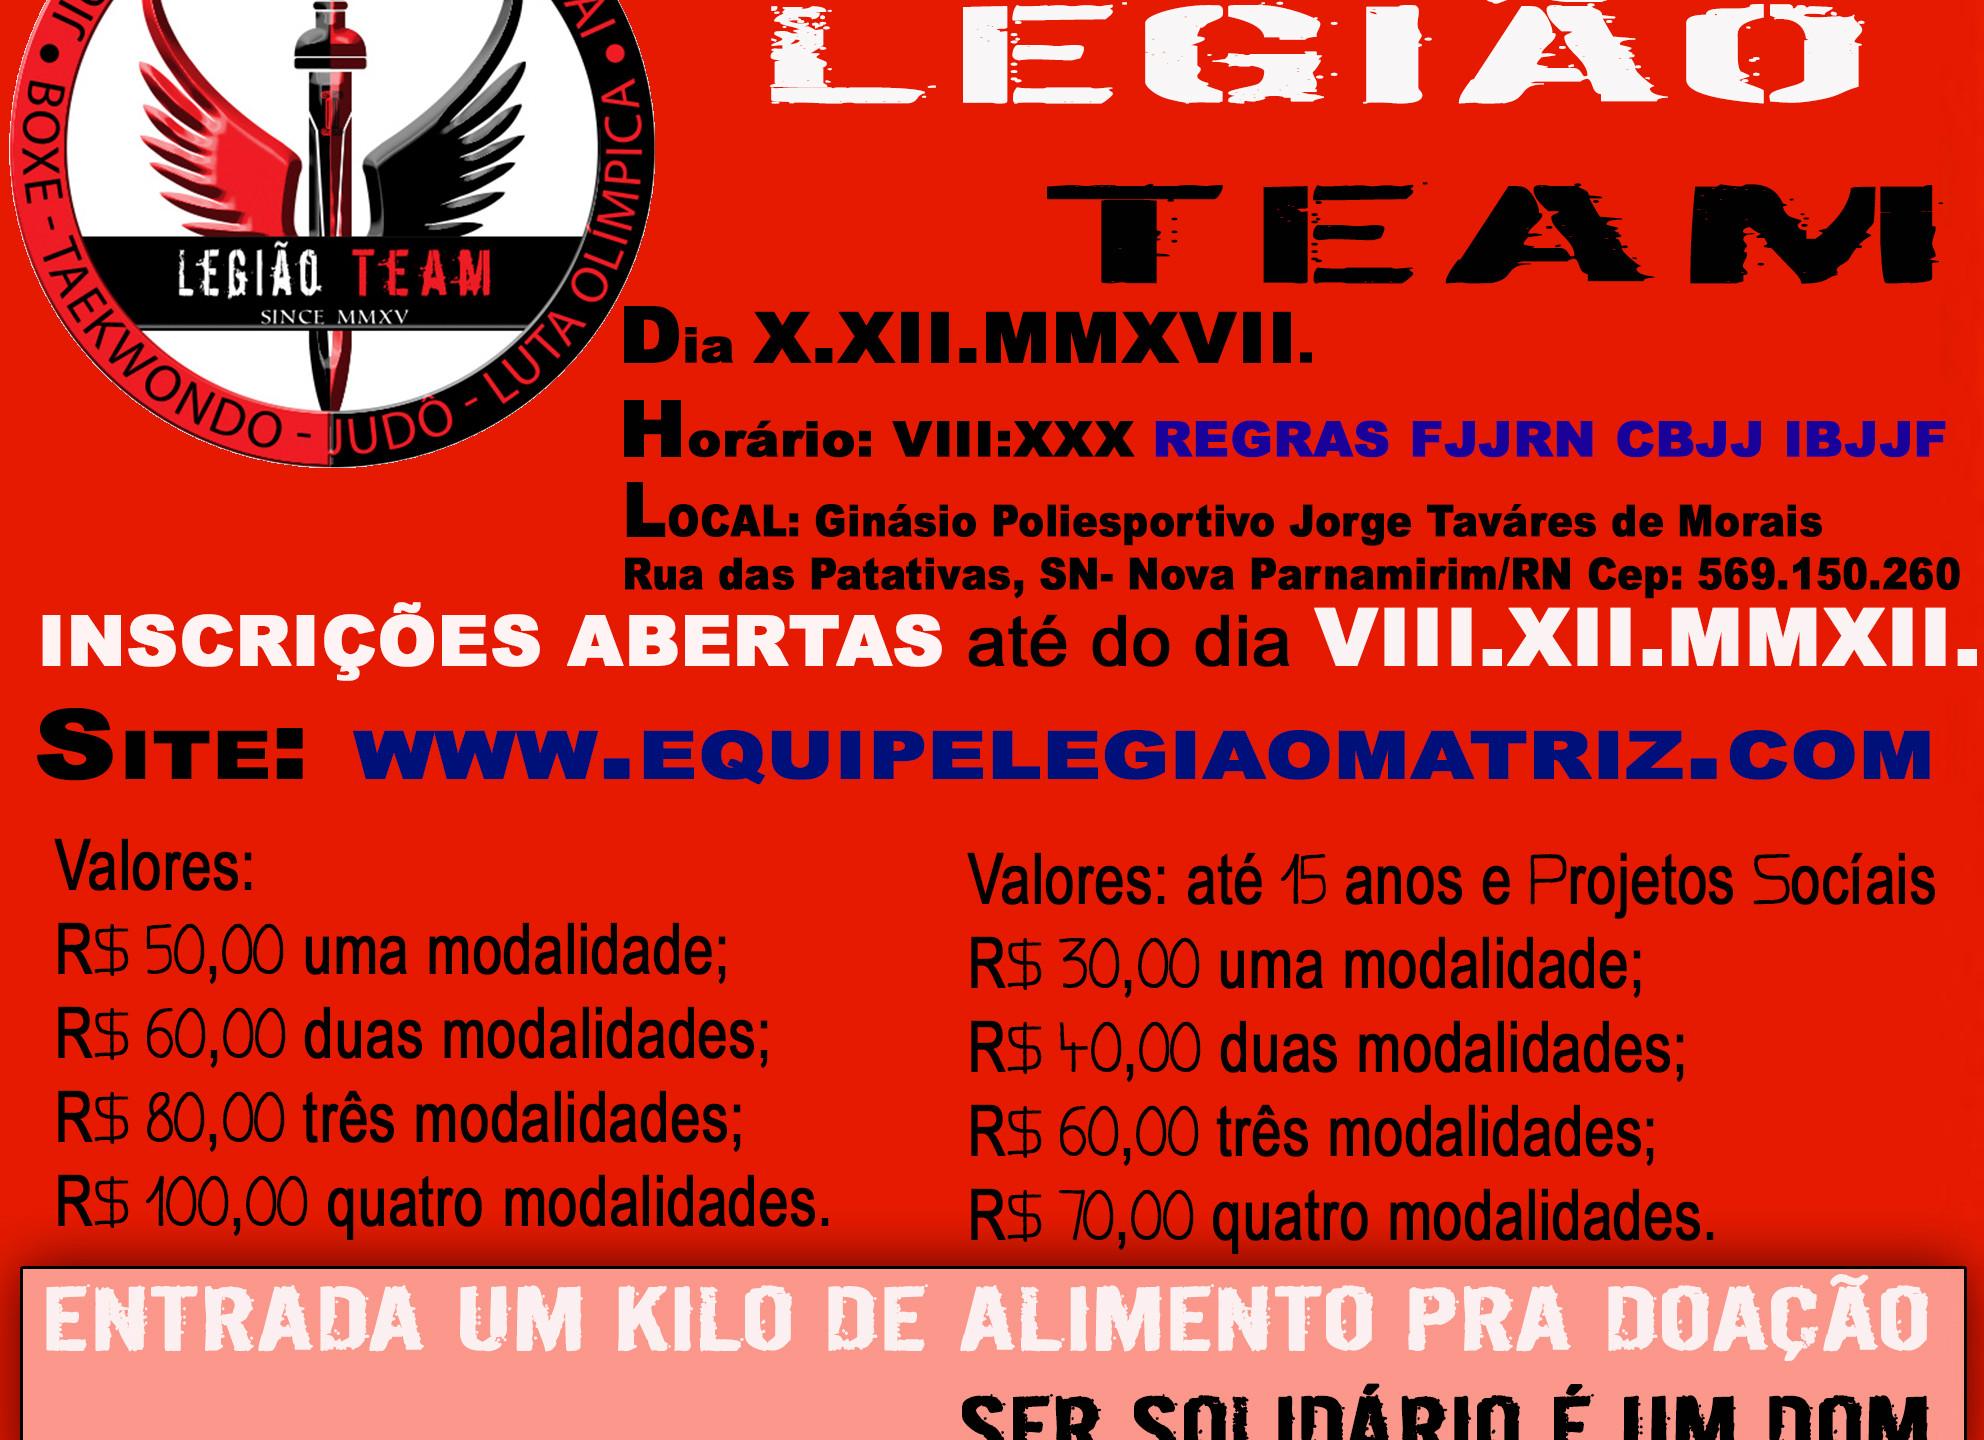 III_COPA_LEGIÃO_TEAM